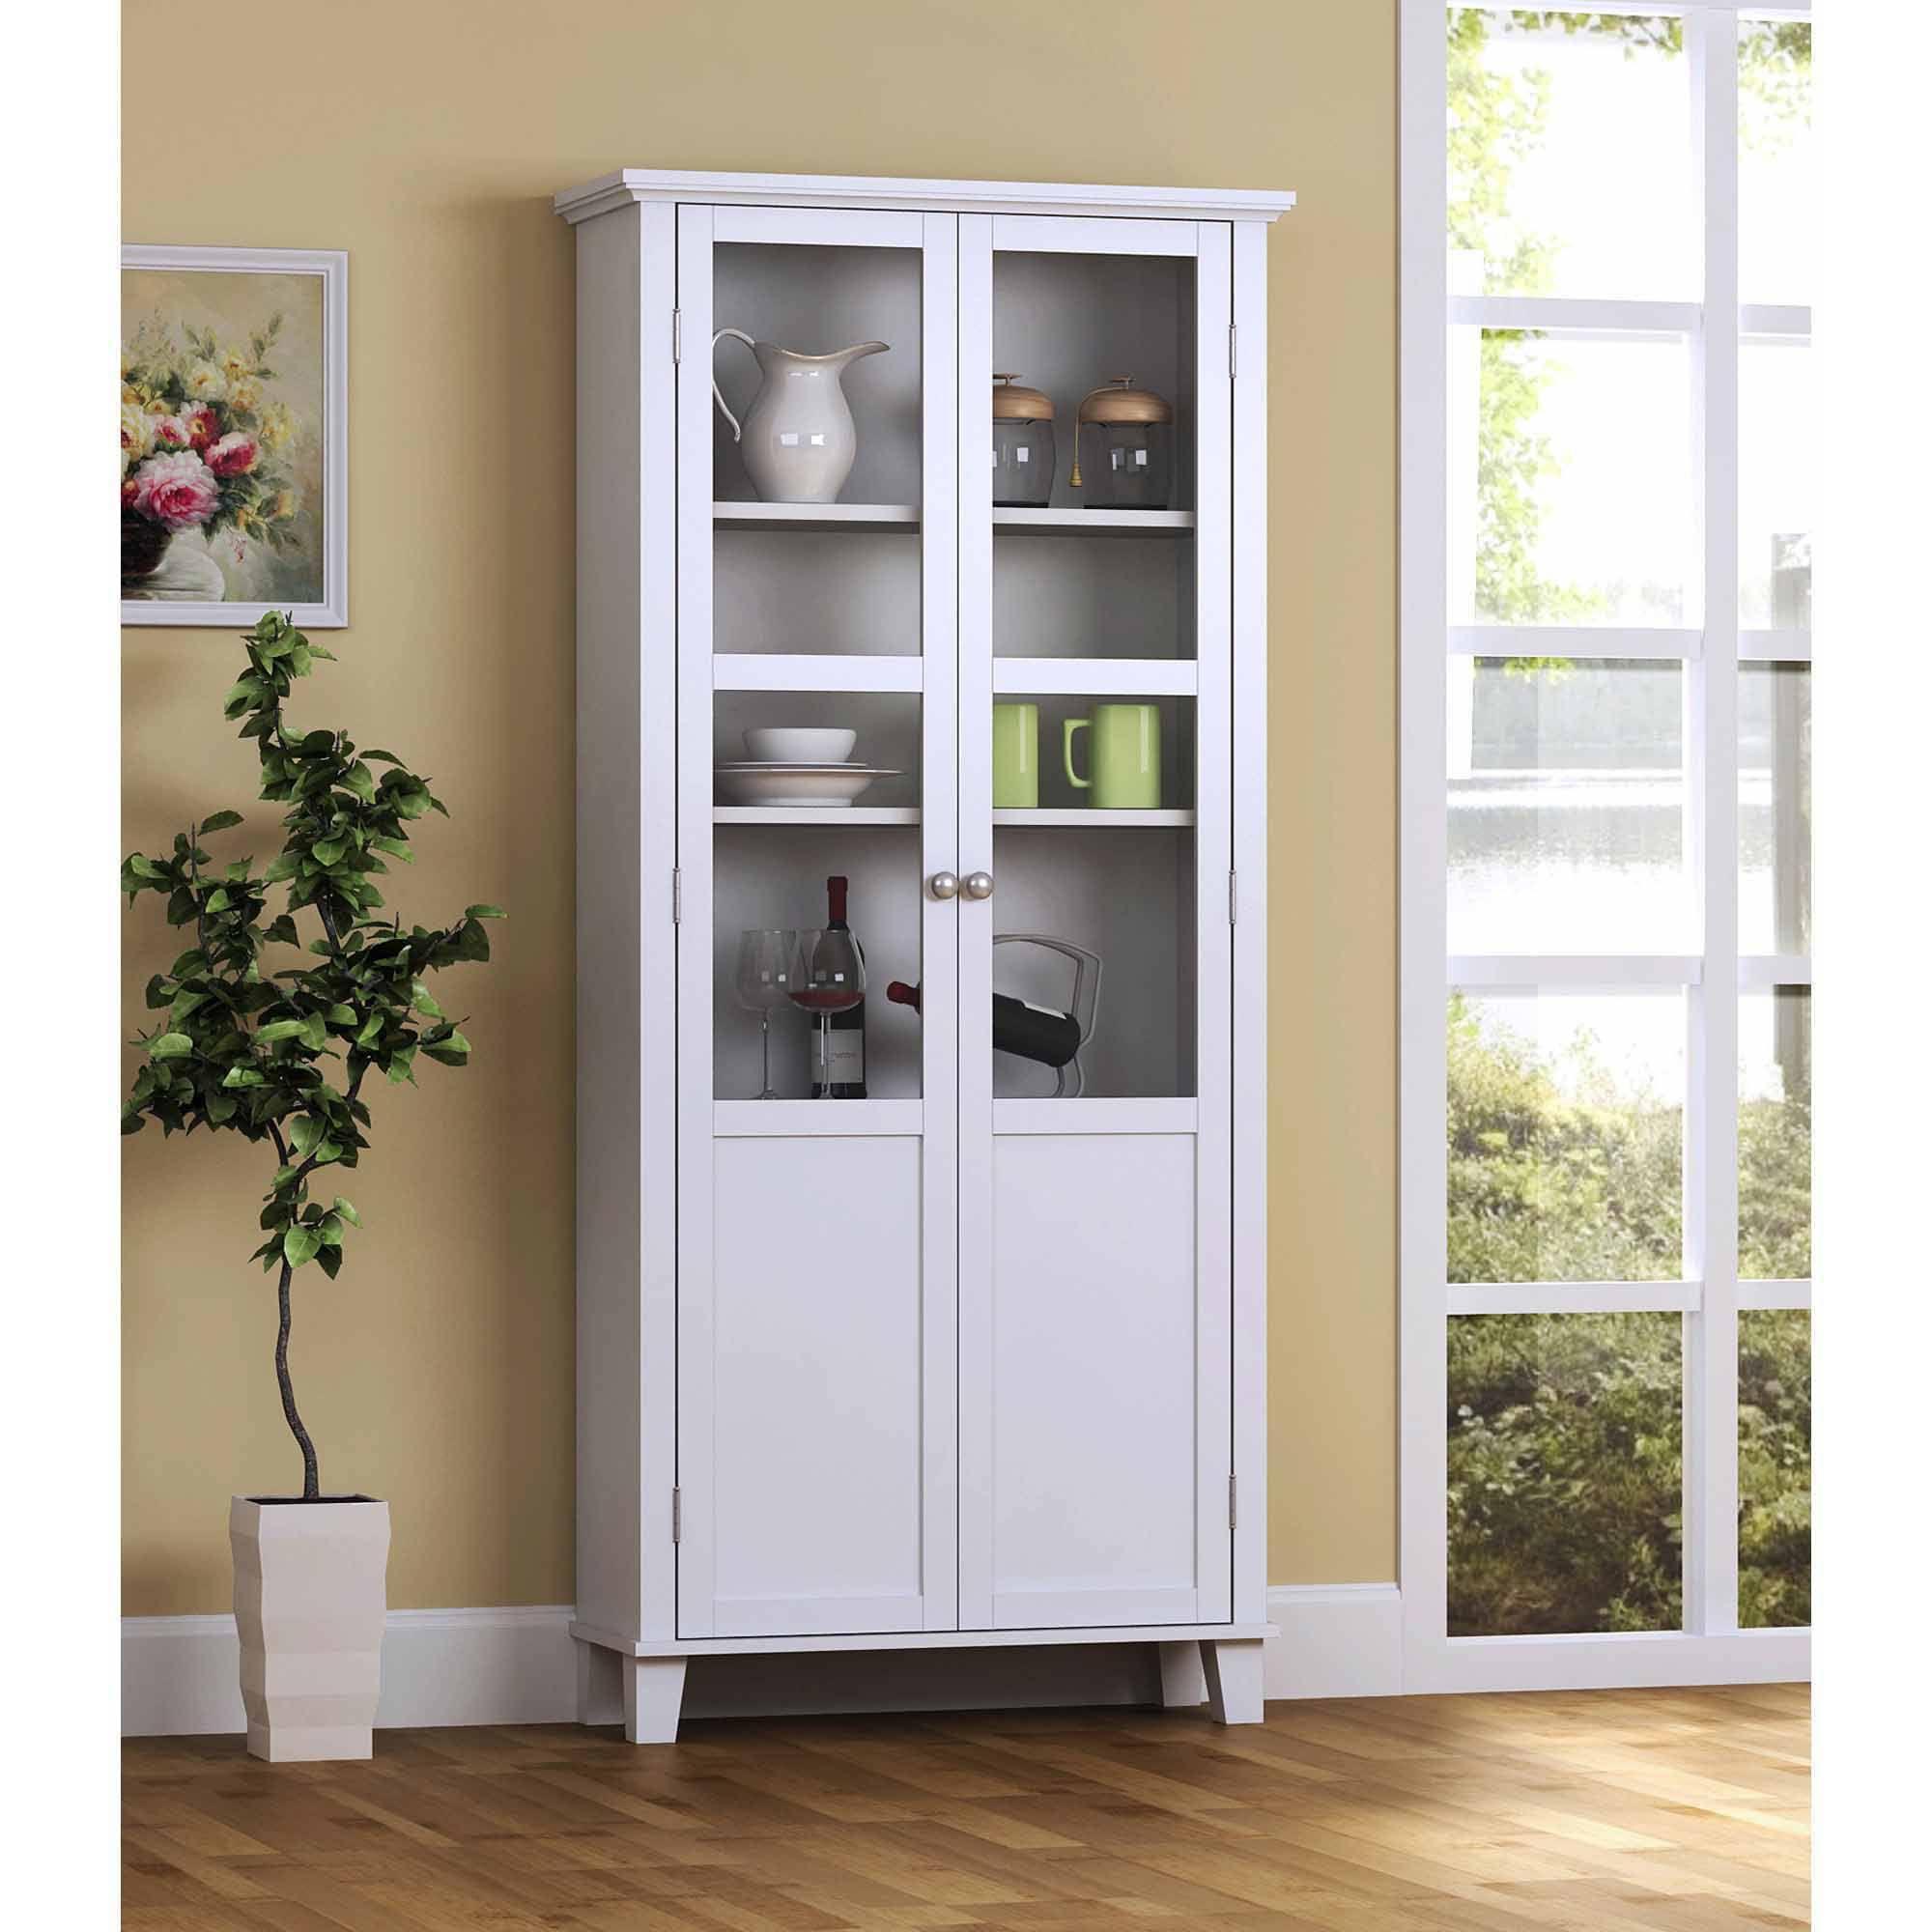 Homestar 2 Door Pantry Cabinet With Glass Doors Walmart Com Storage Cabinet White Storage Cabinets Pantry Storage Cabinet